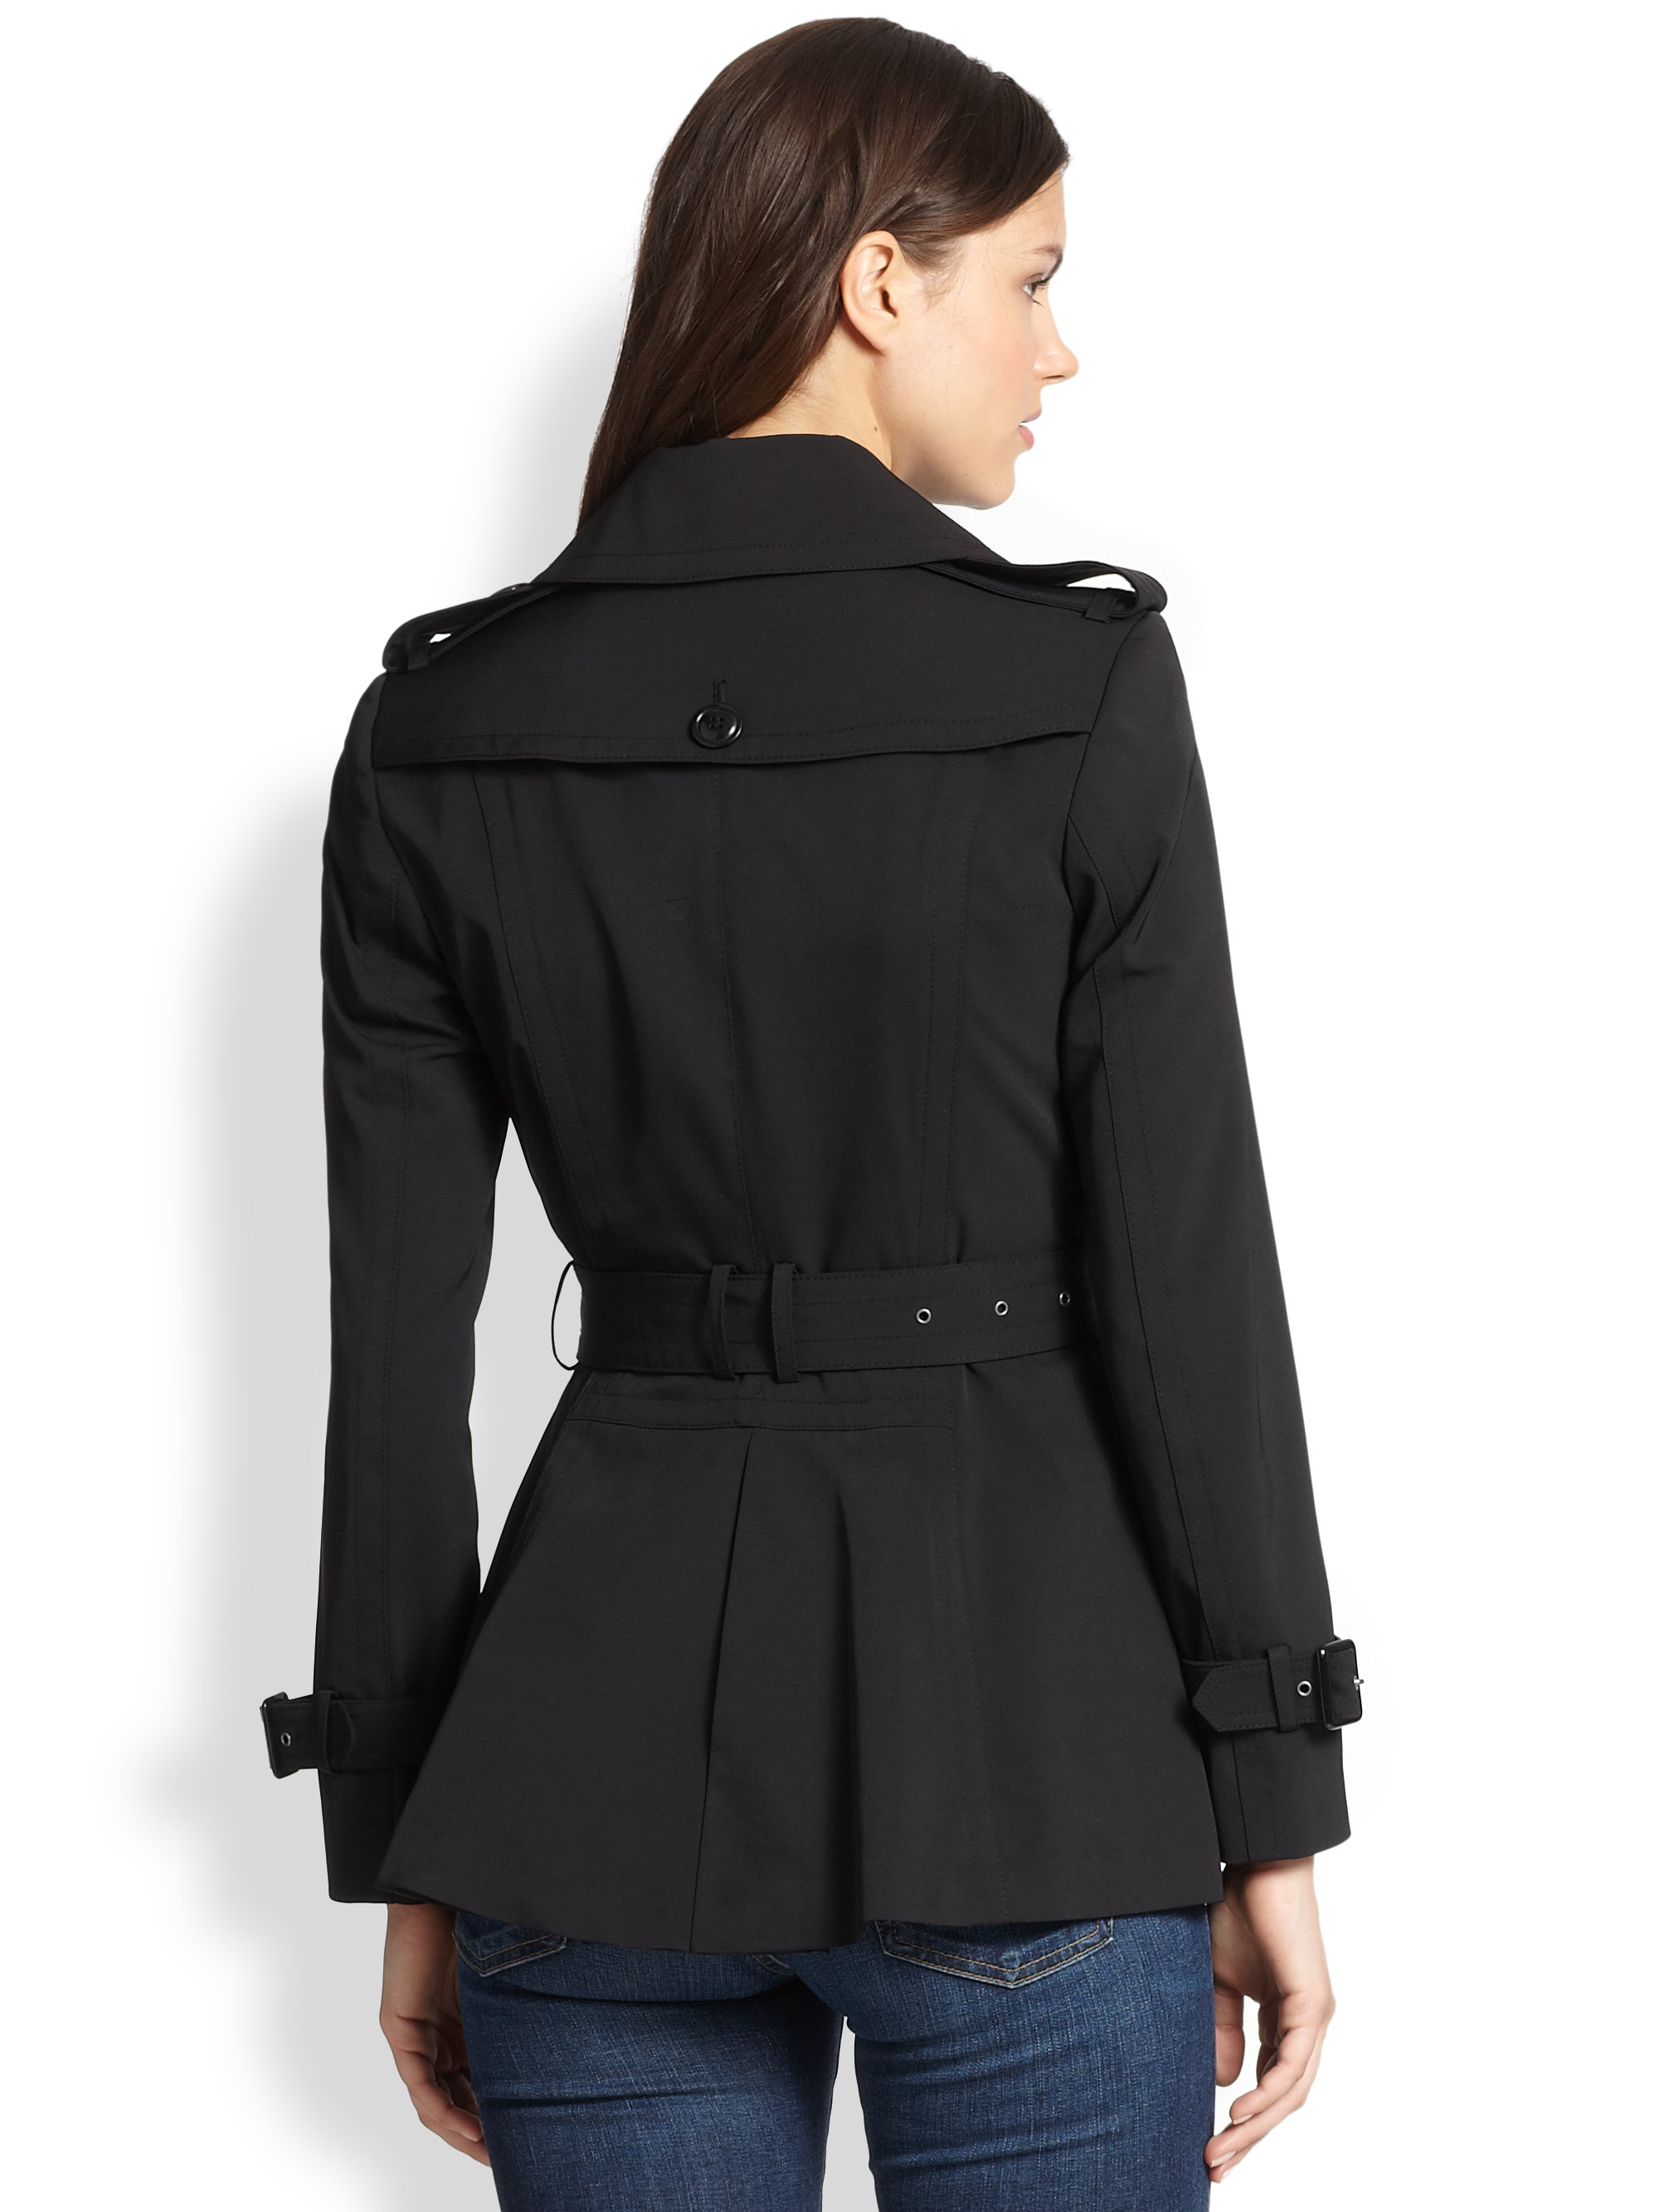 Trina turk Ellie Short Trenchcoat in Black | Lyst